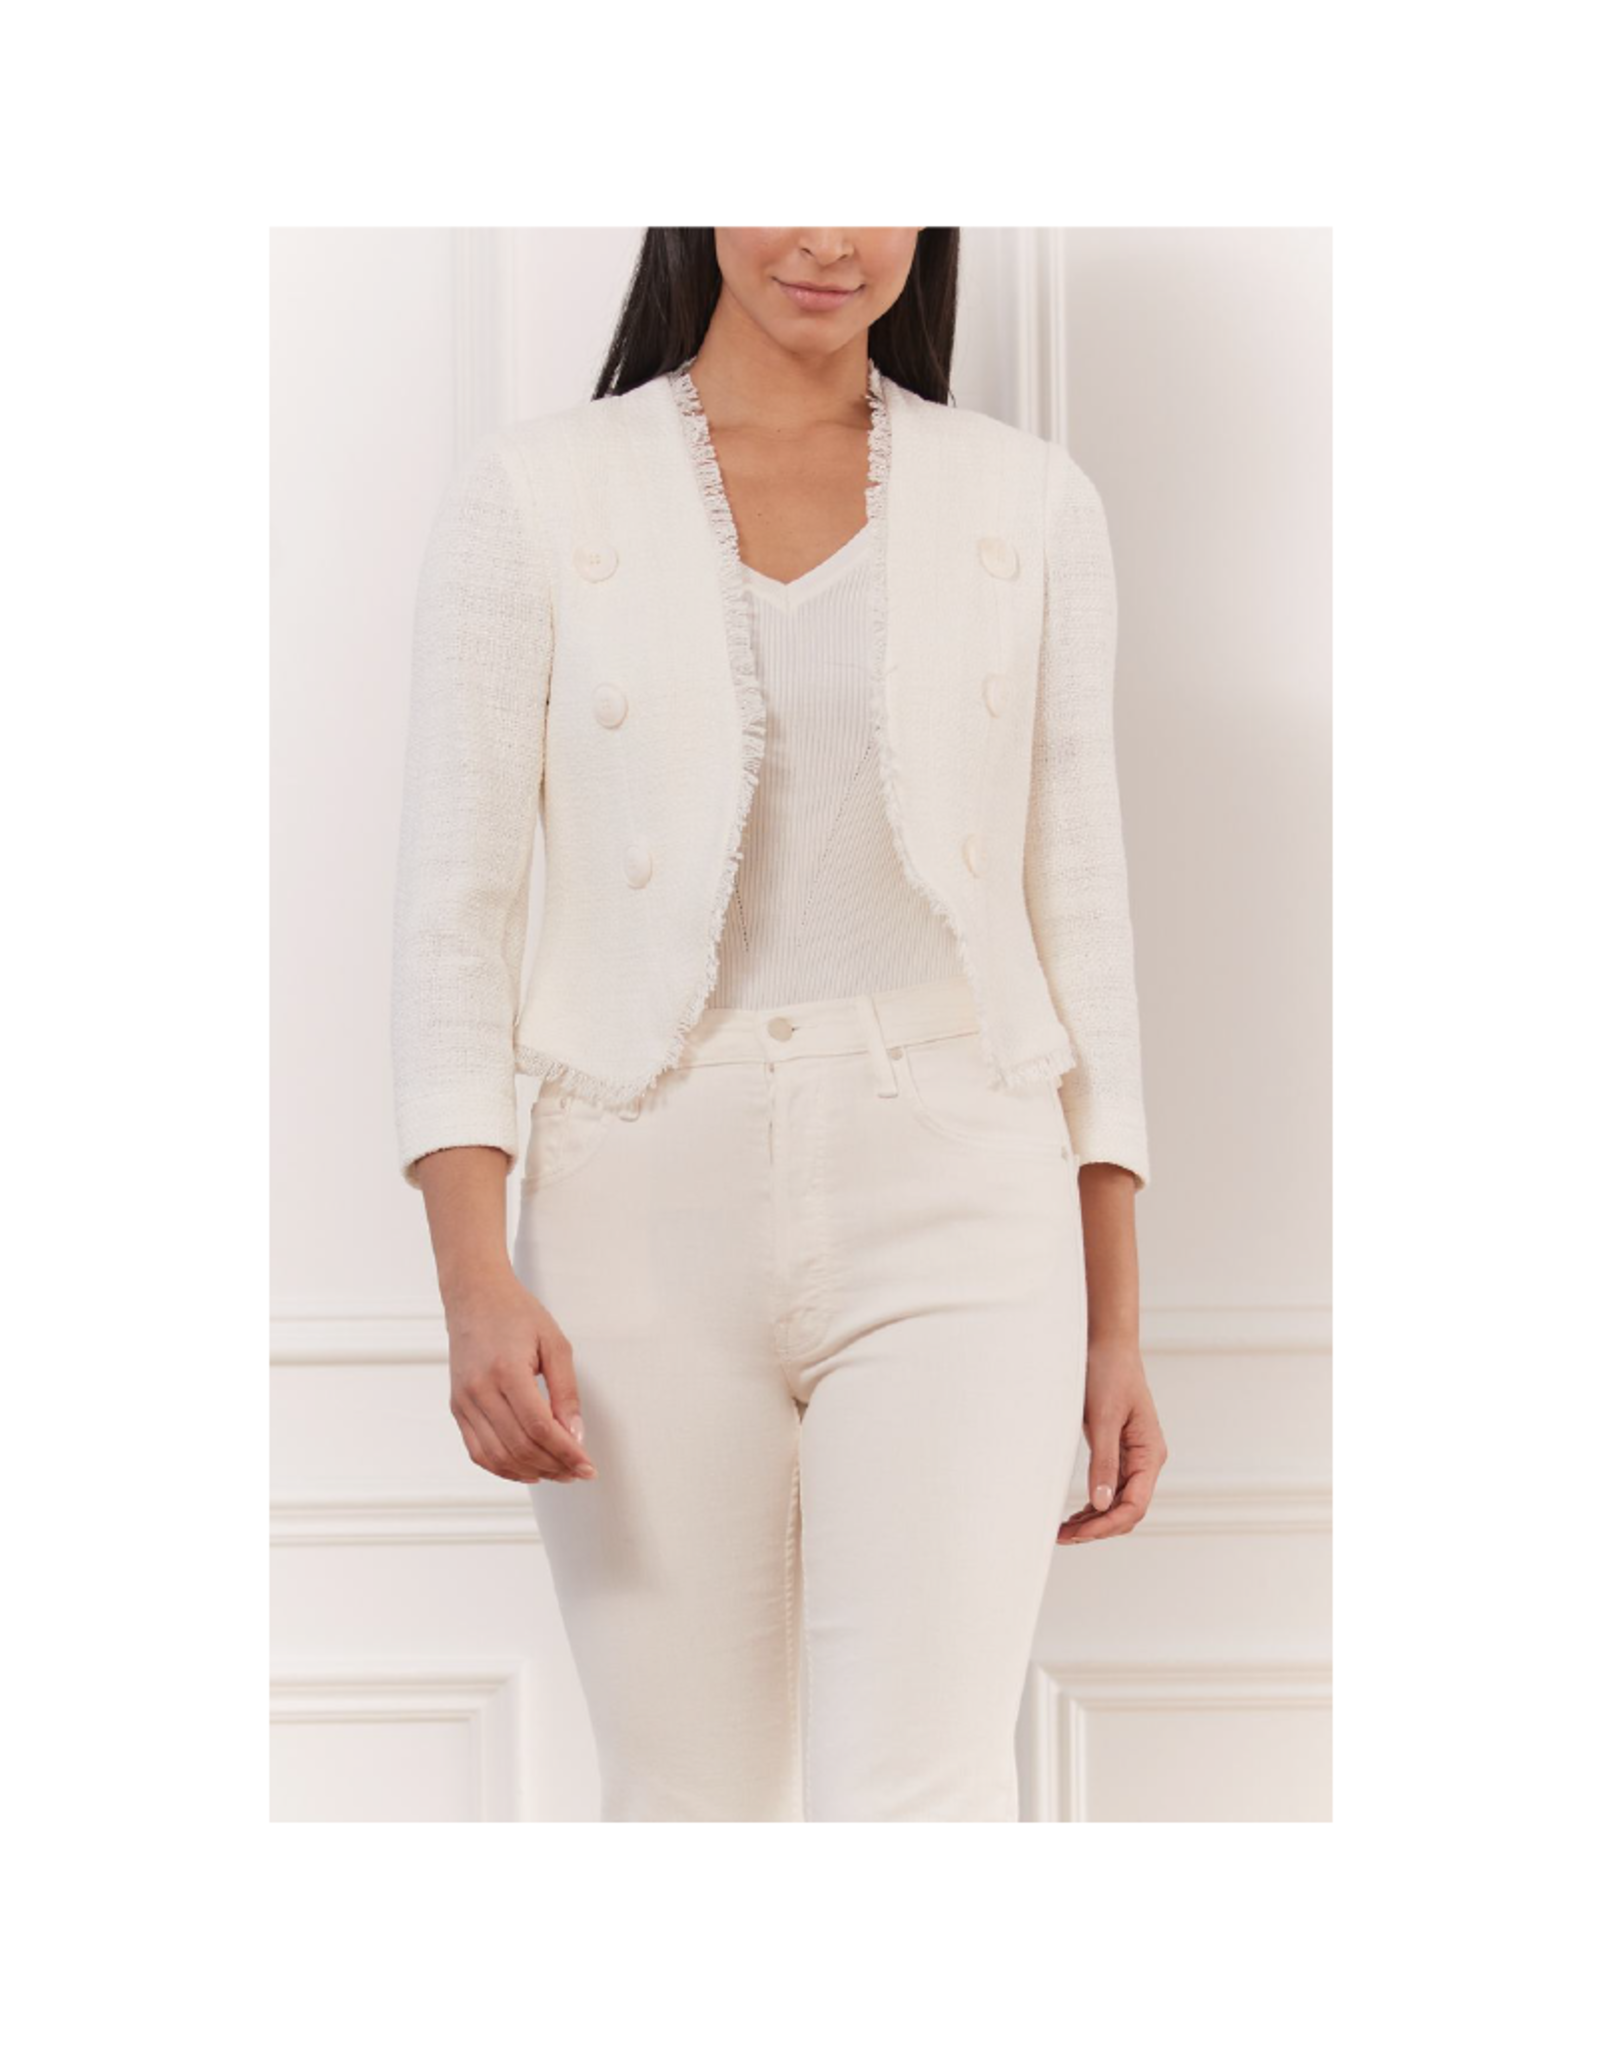 Iris Chanel Tweed Cropped Open Jacket